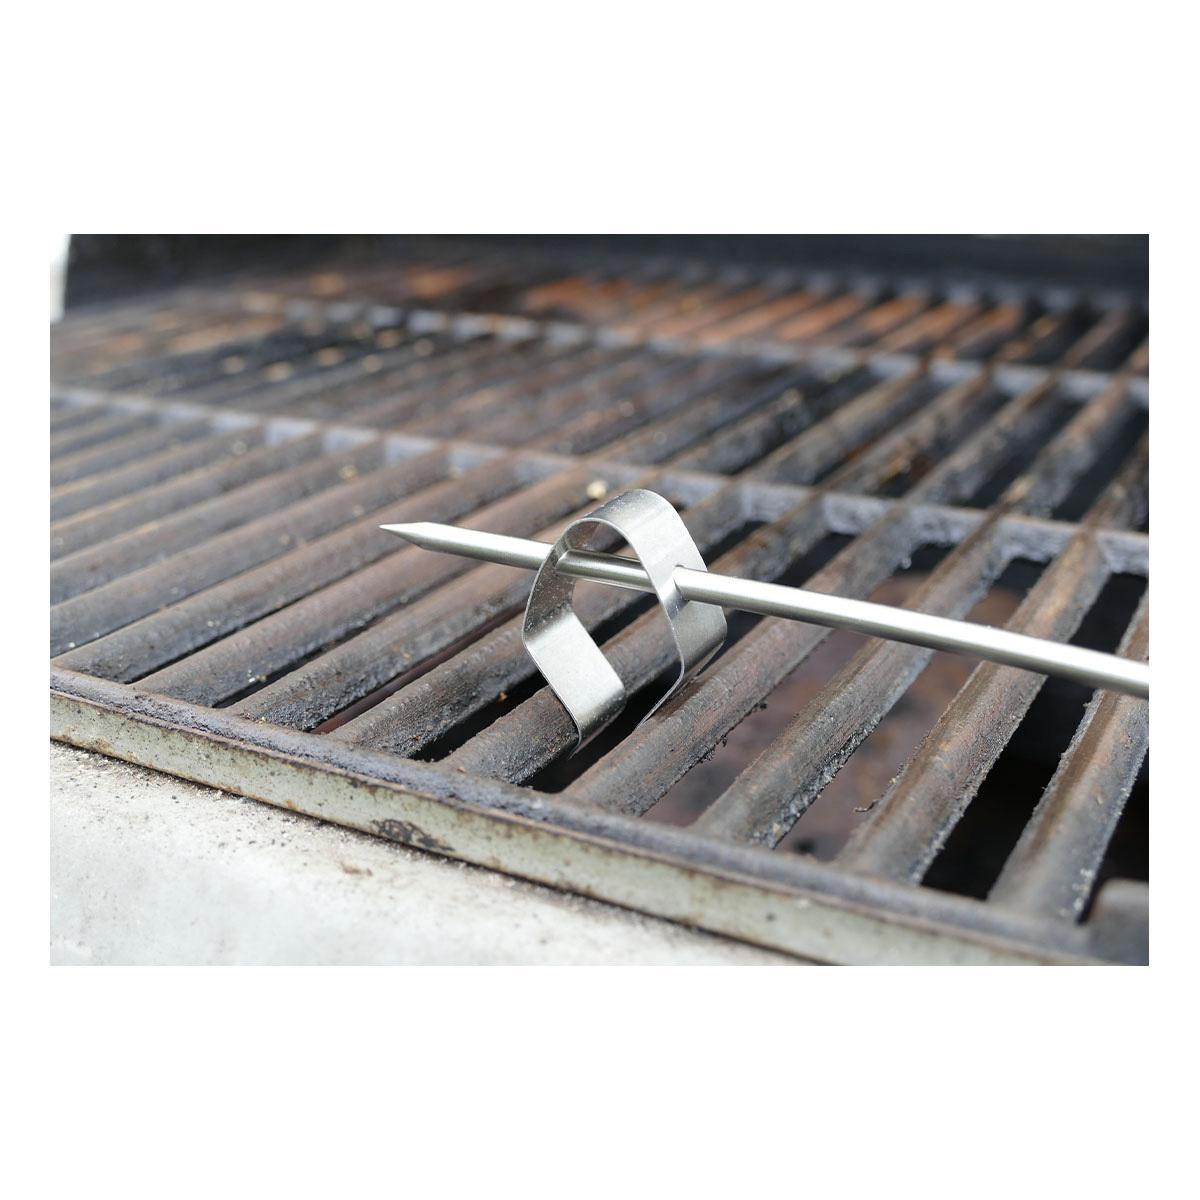 30-3525-60-clips-für-grill-bratenthermometer-anwendung-grill-1200x1200px.jpg